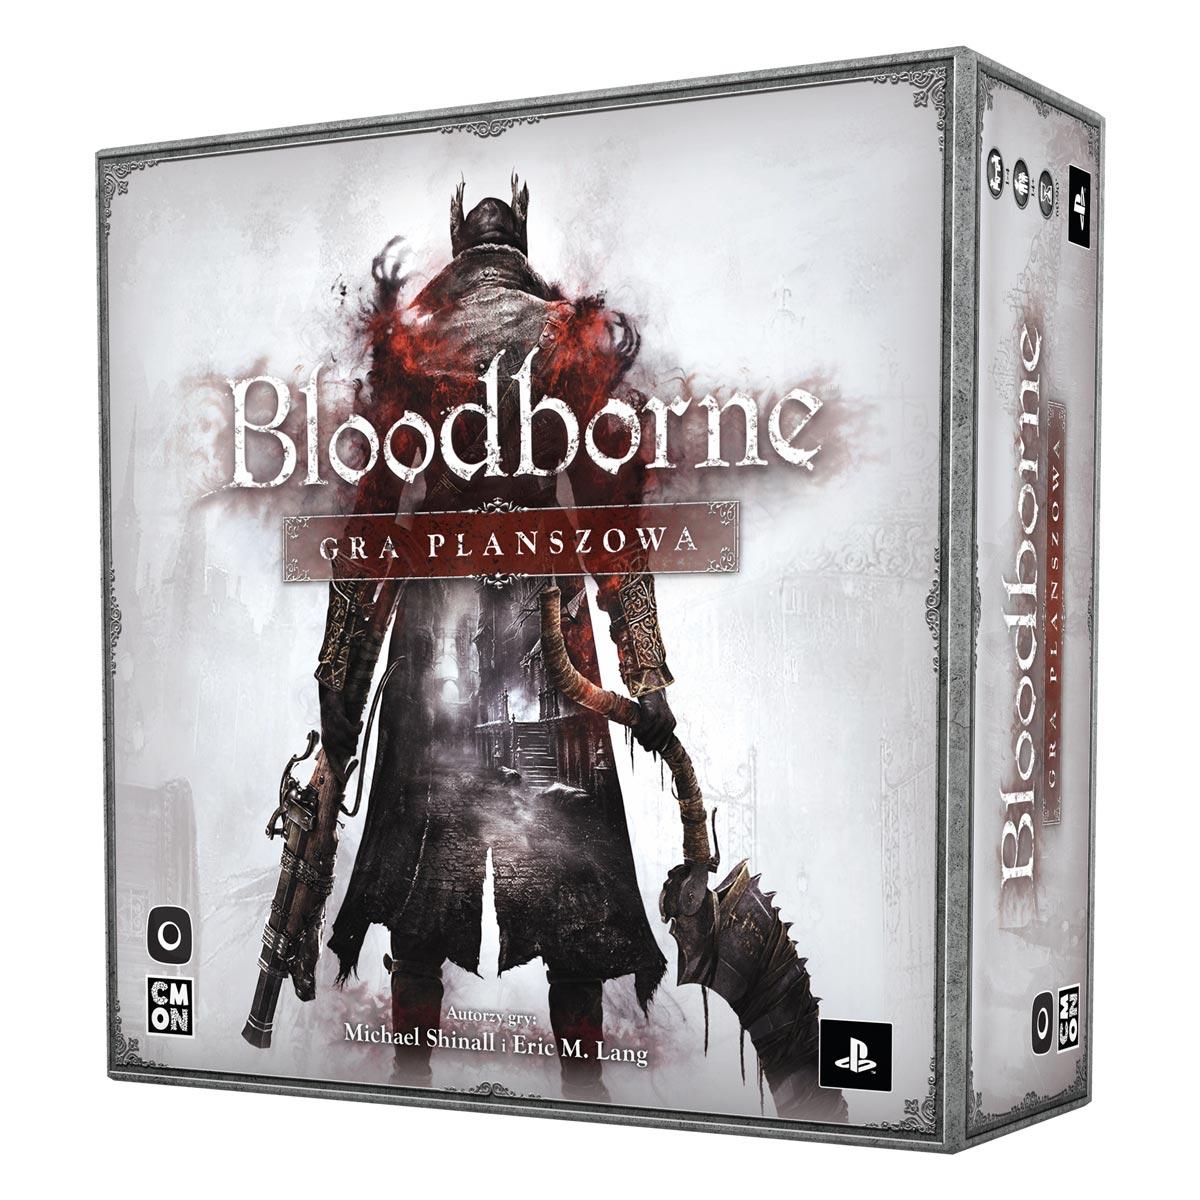 Bloodborne - gra planszowa (PL)